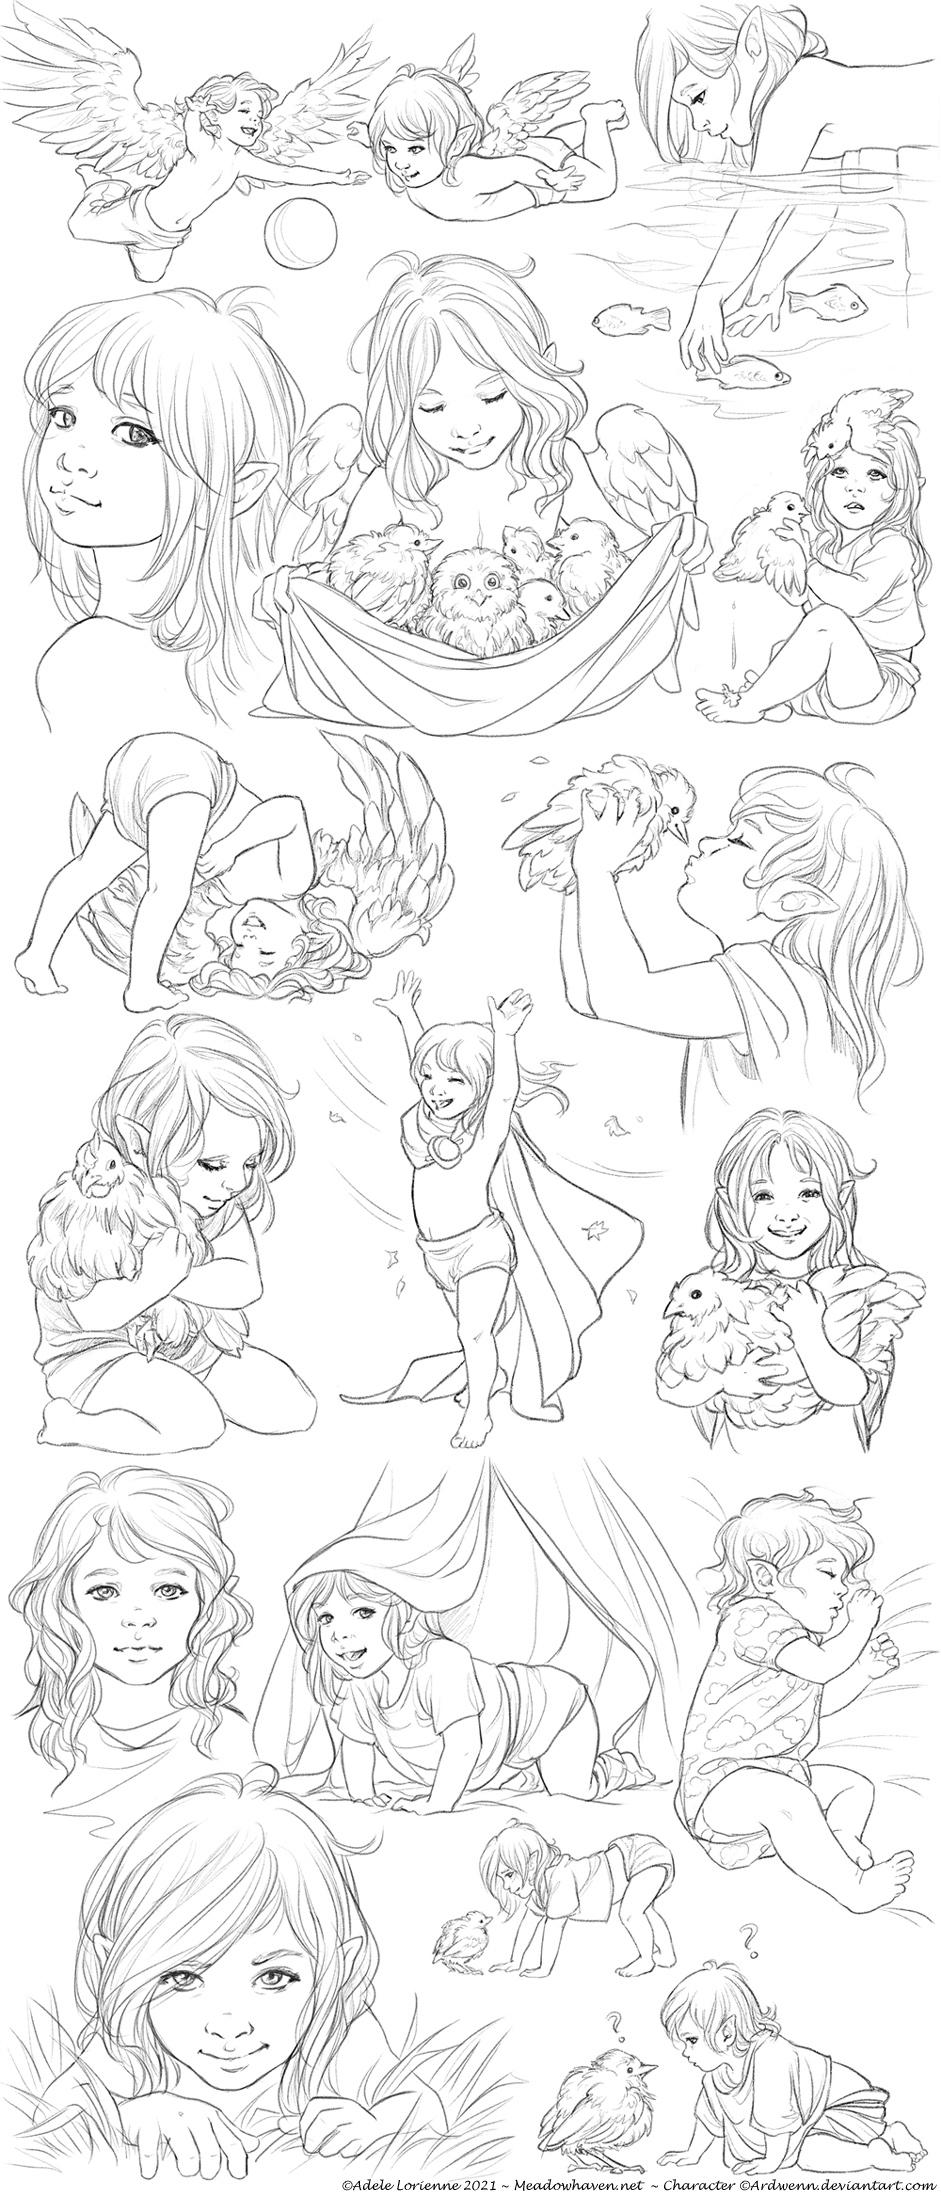 Elerus Sketchpage Collage